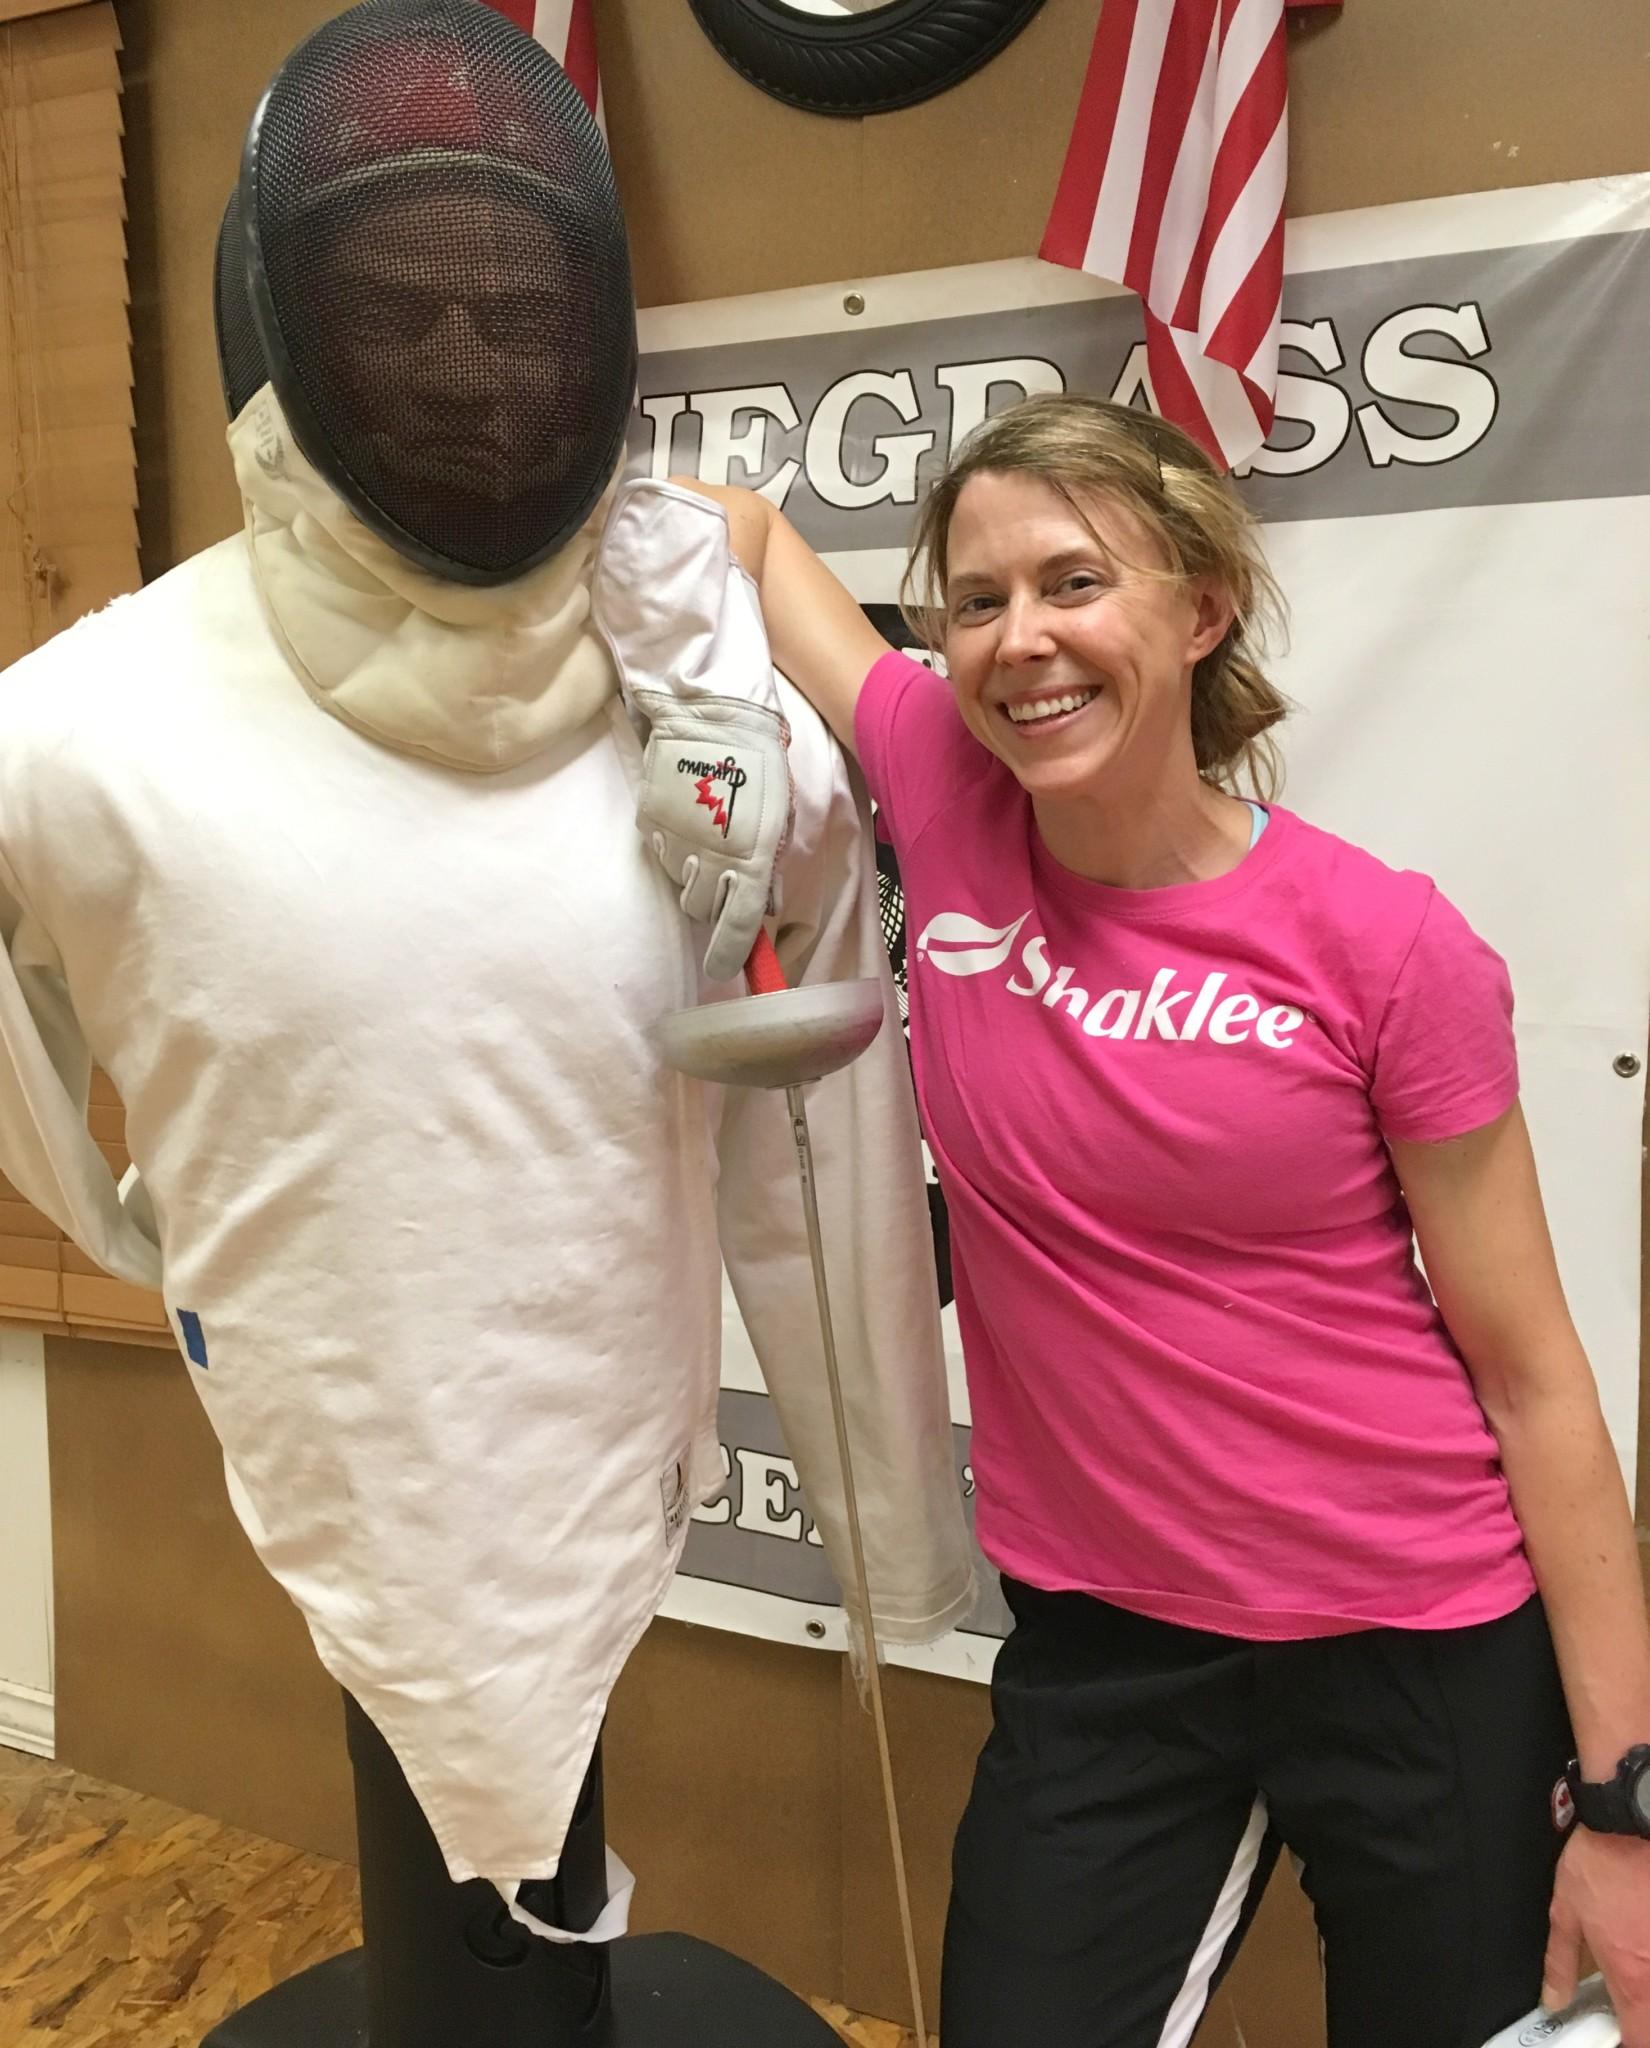 Donna Vakalis fencing dummy